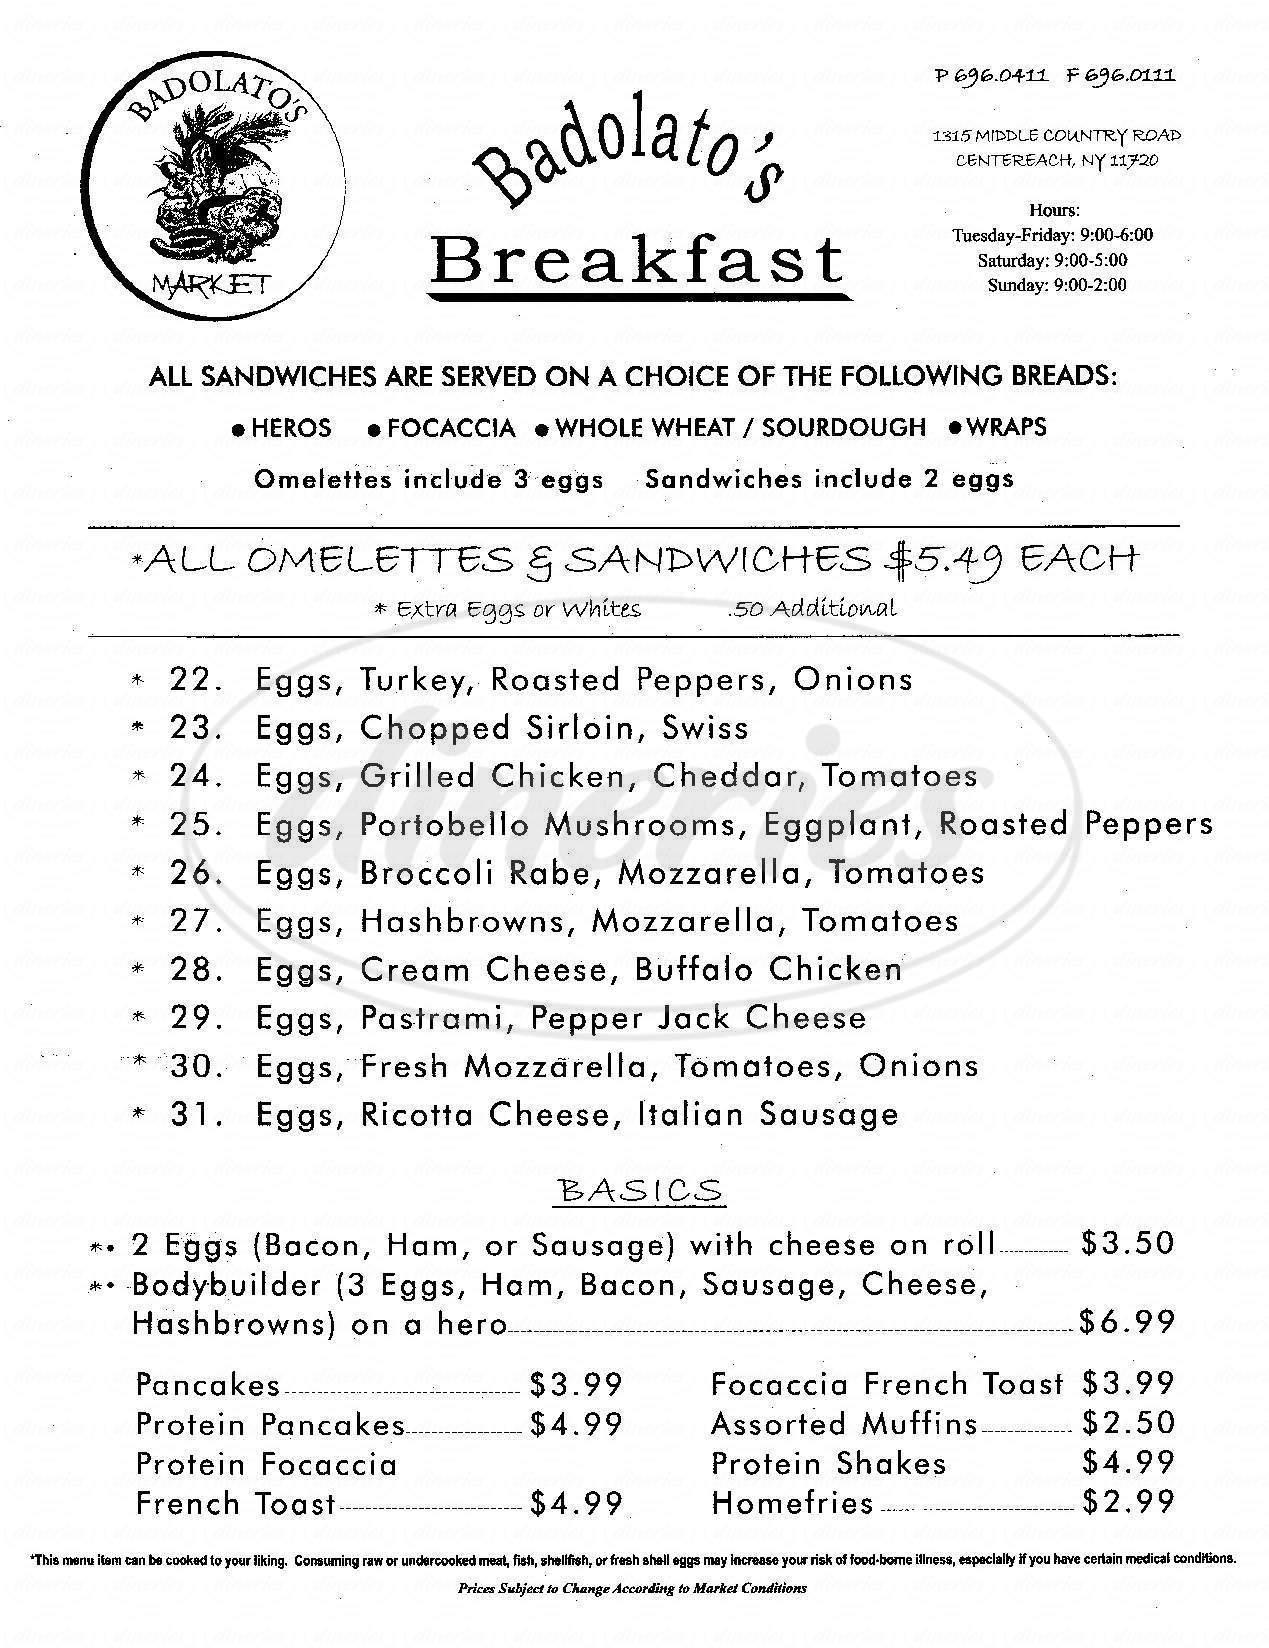 menu for Badolato's Market